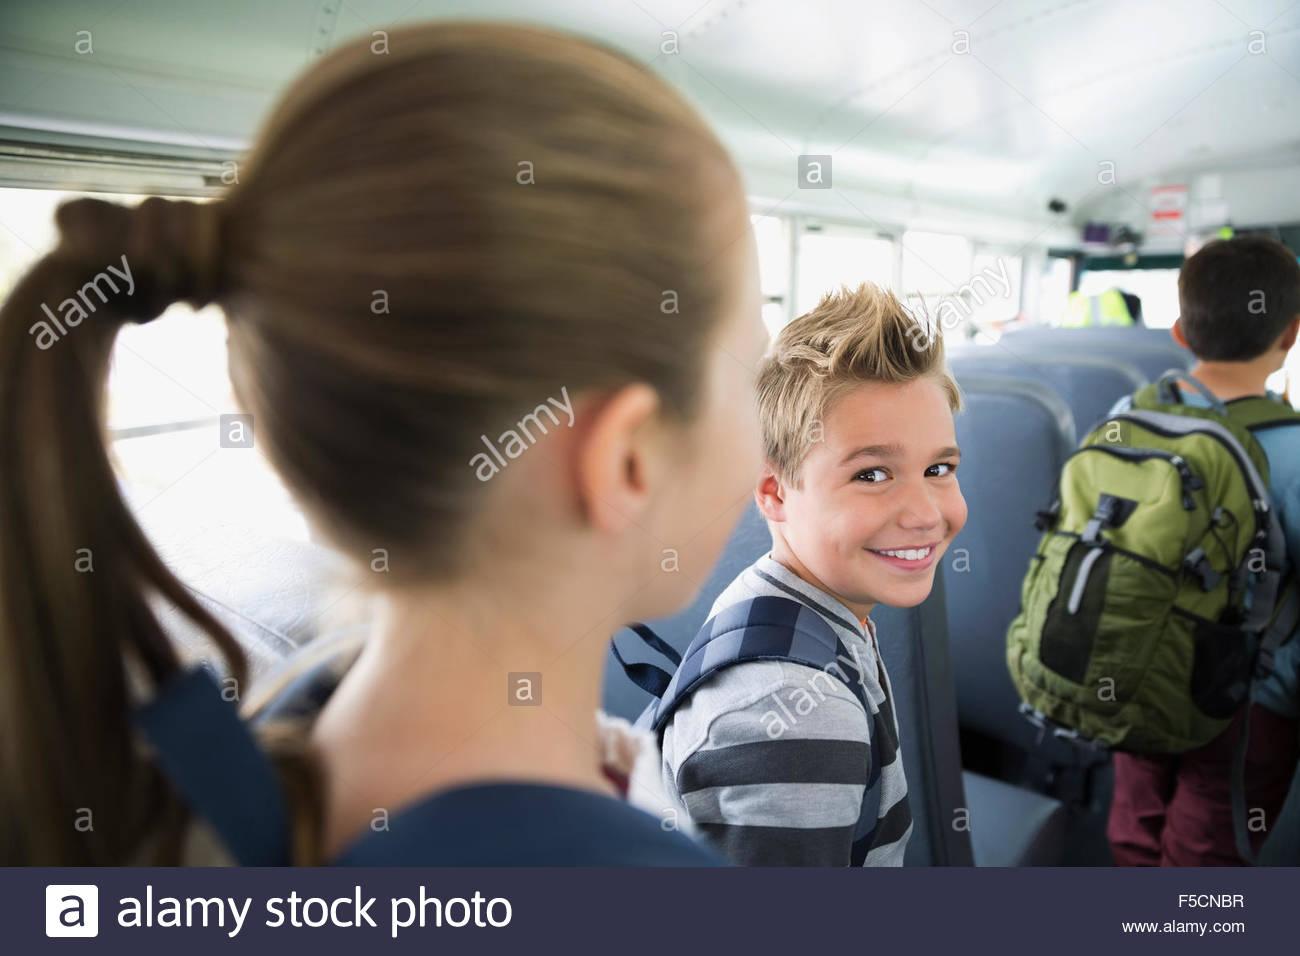 Portrait smiling schoolboy in aisle of school bus - Stock Image